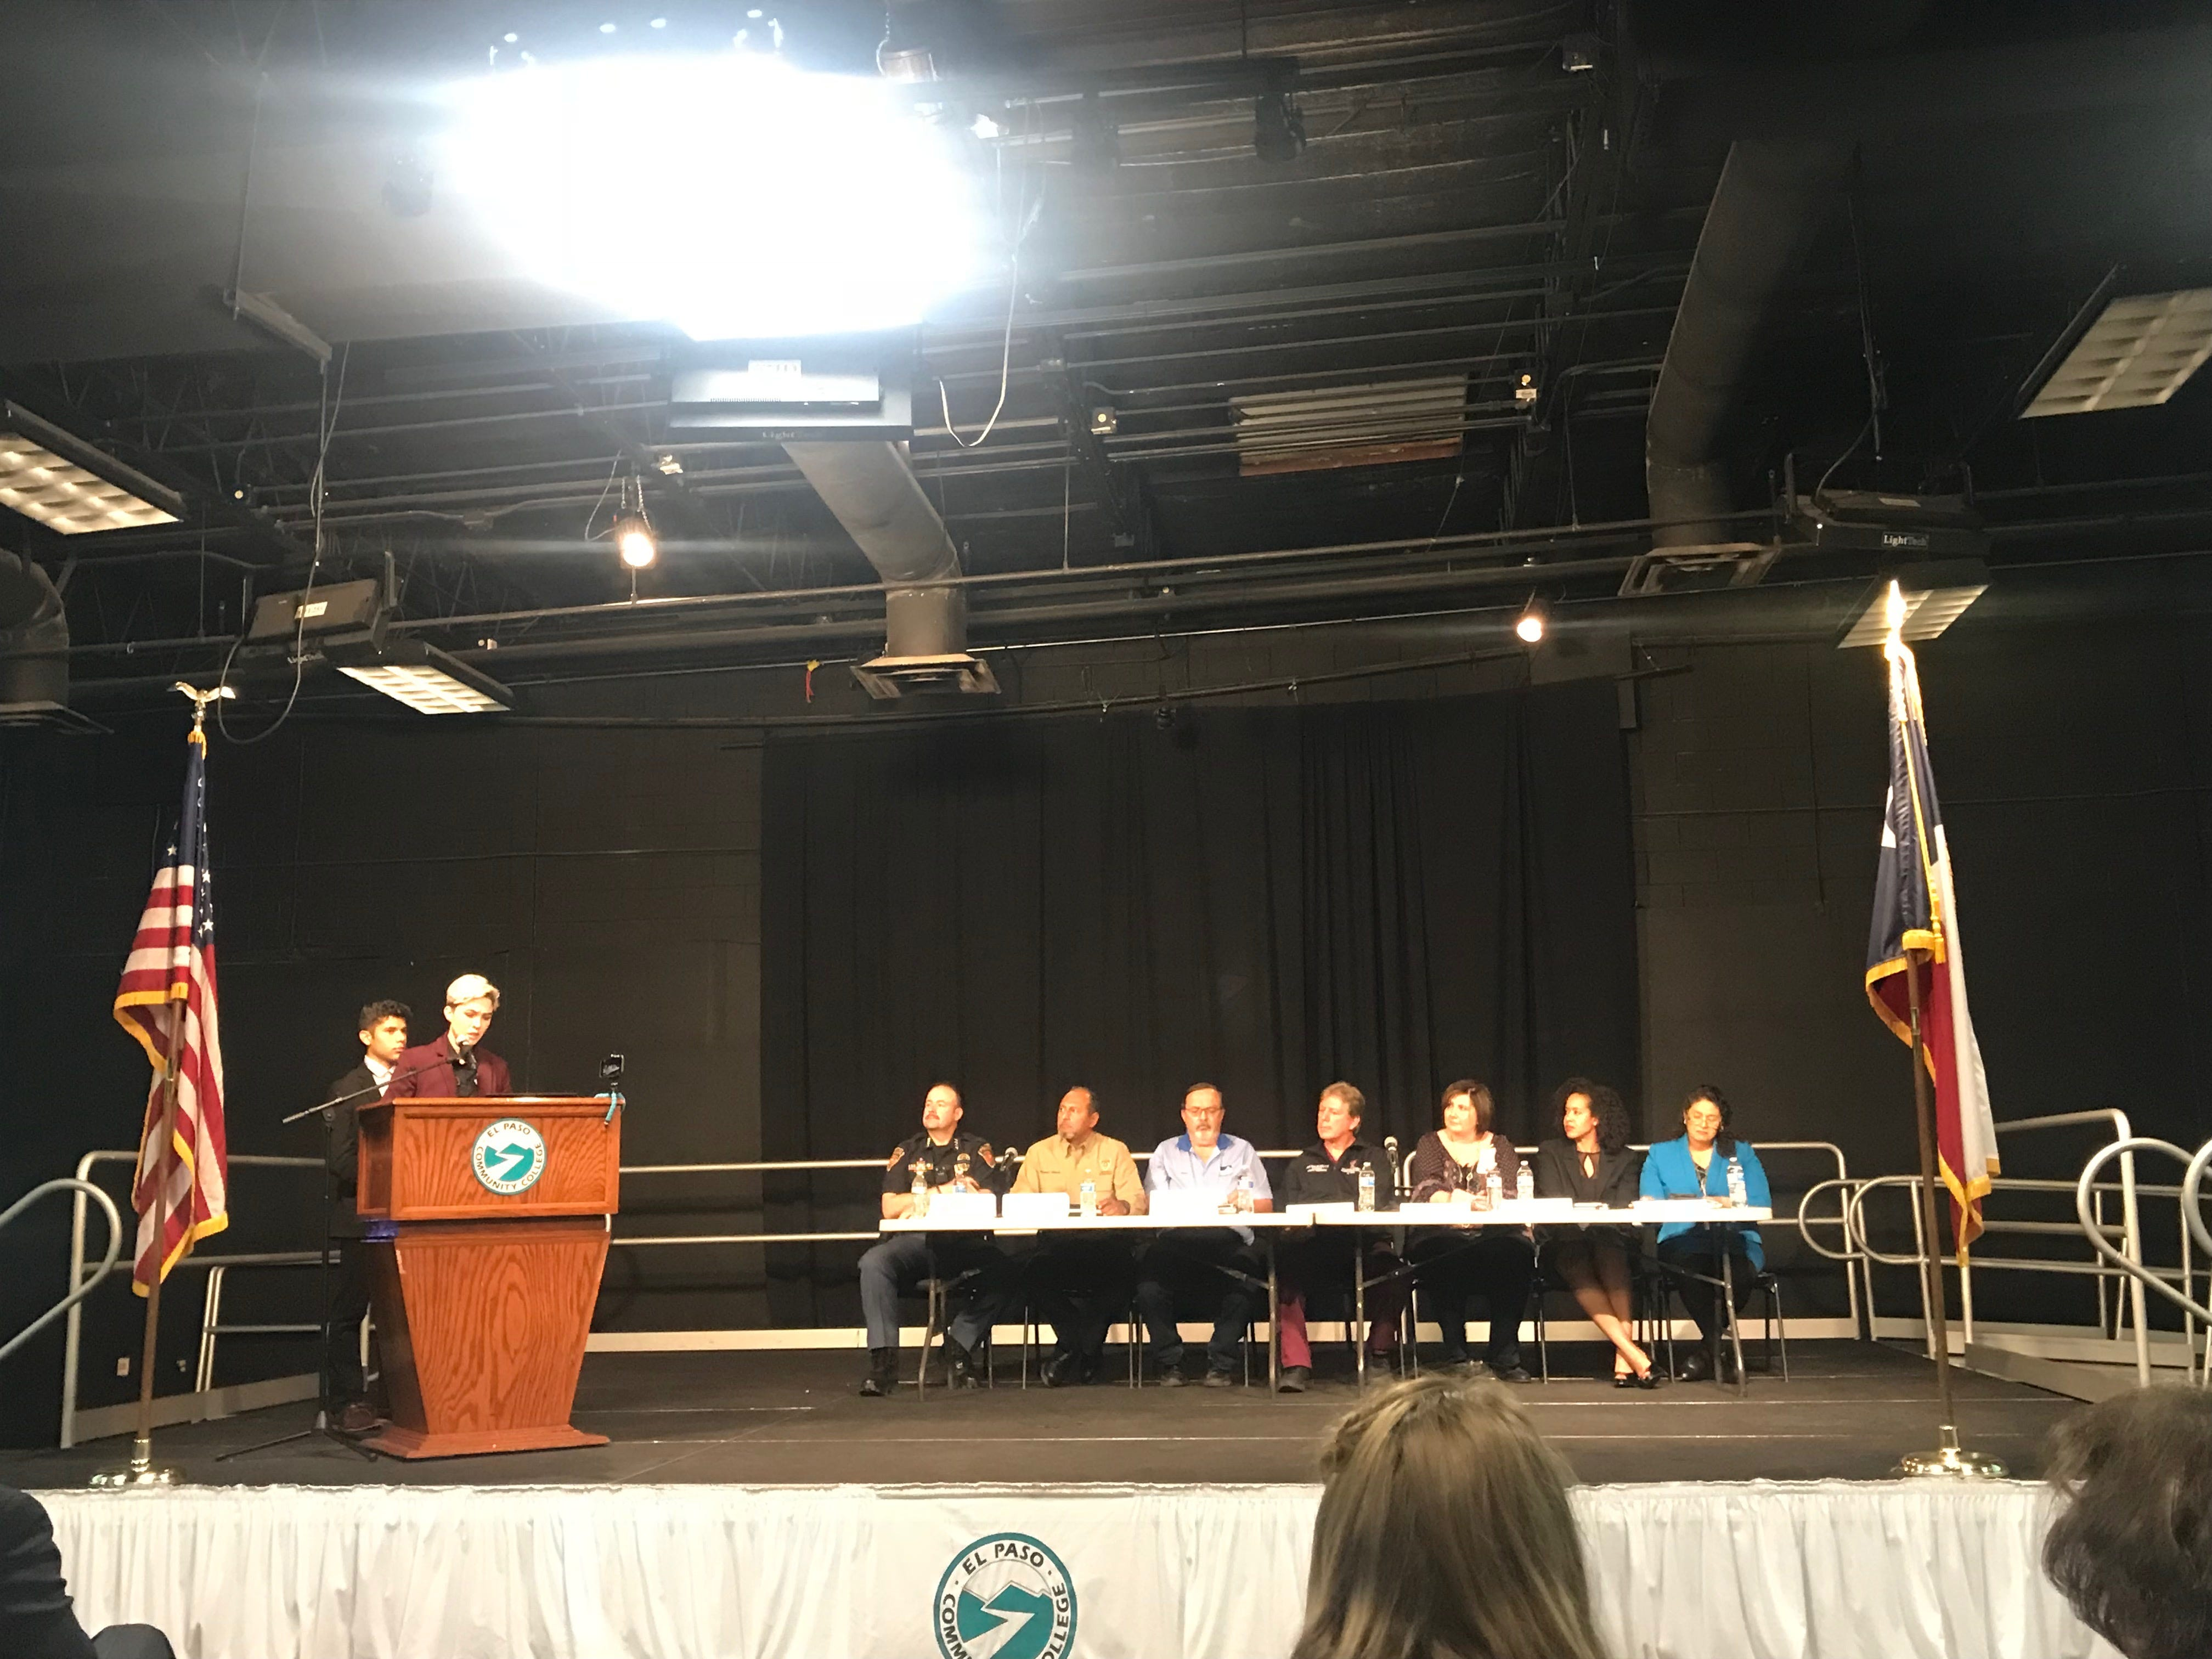 El Paso education, medical leaders offer ideas on stopping school shootings, gun violence   El Paso Times